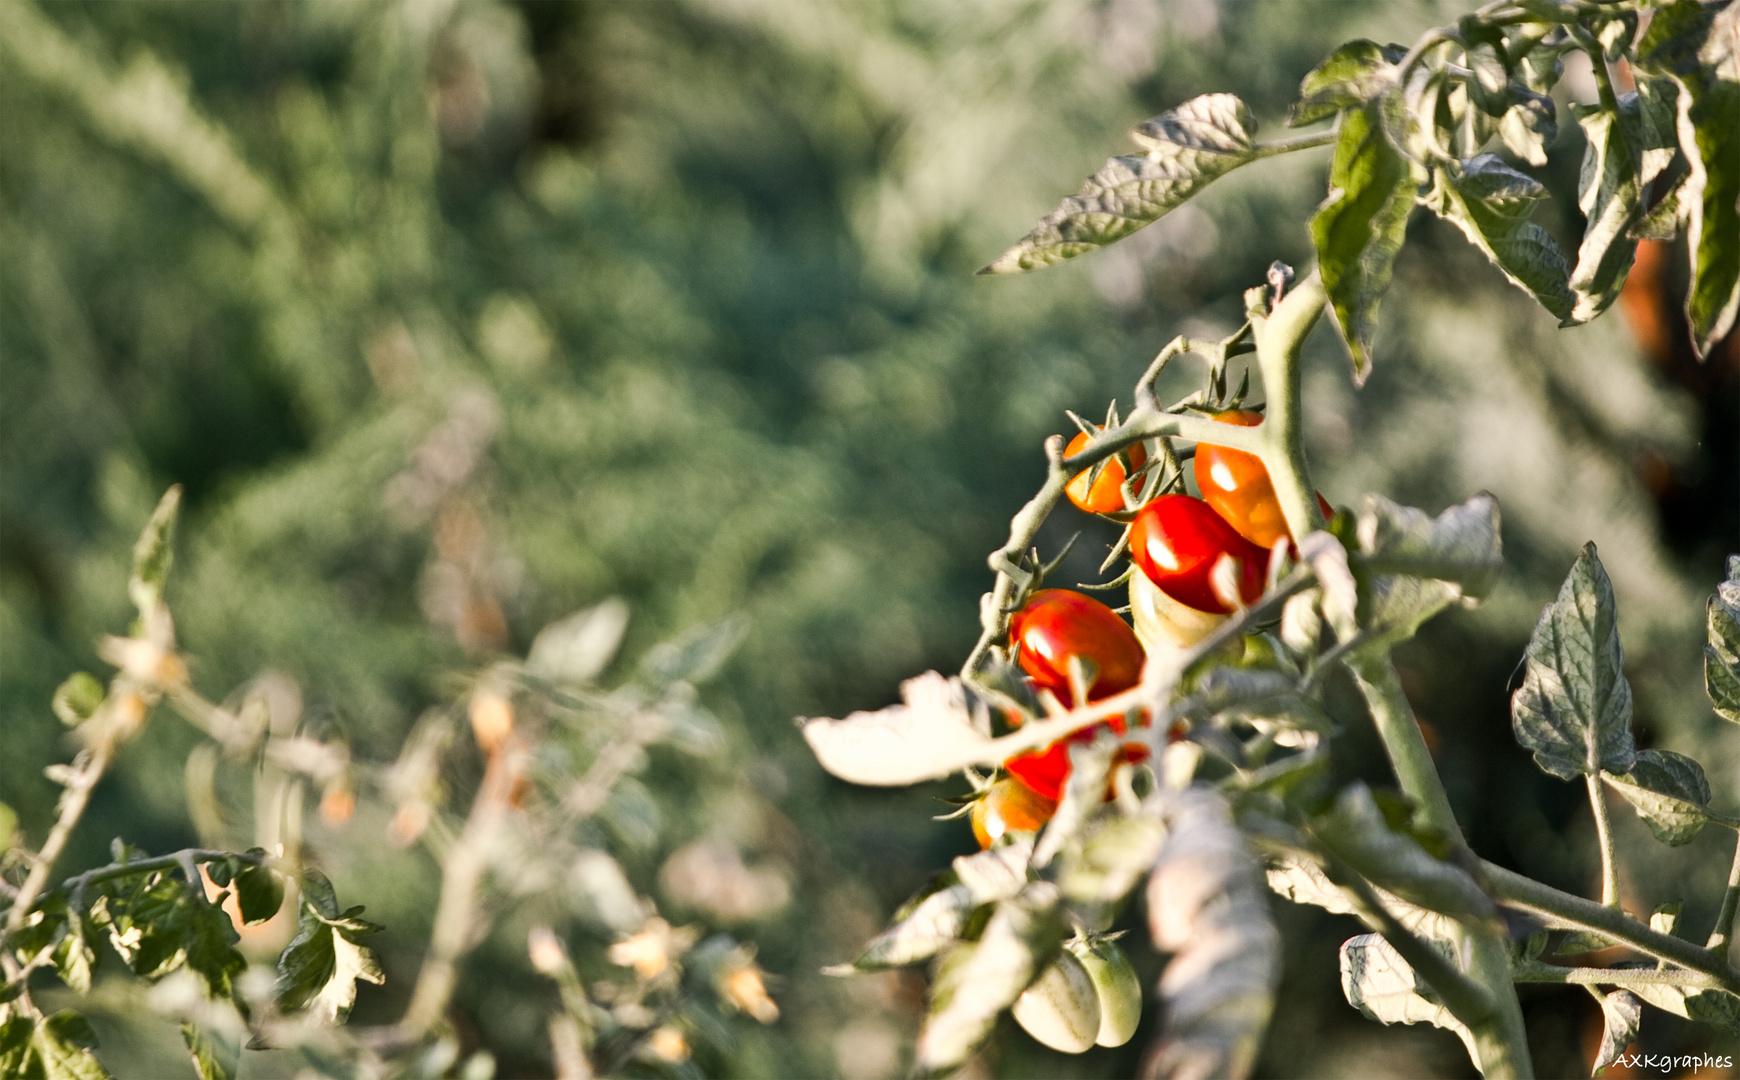 Family Tomato hanging arround